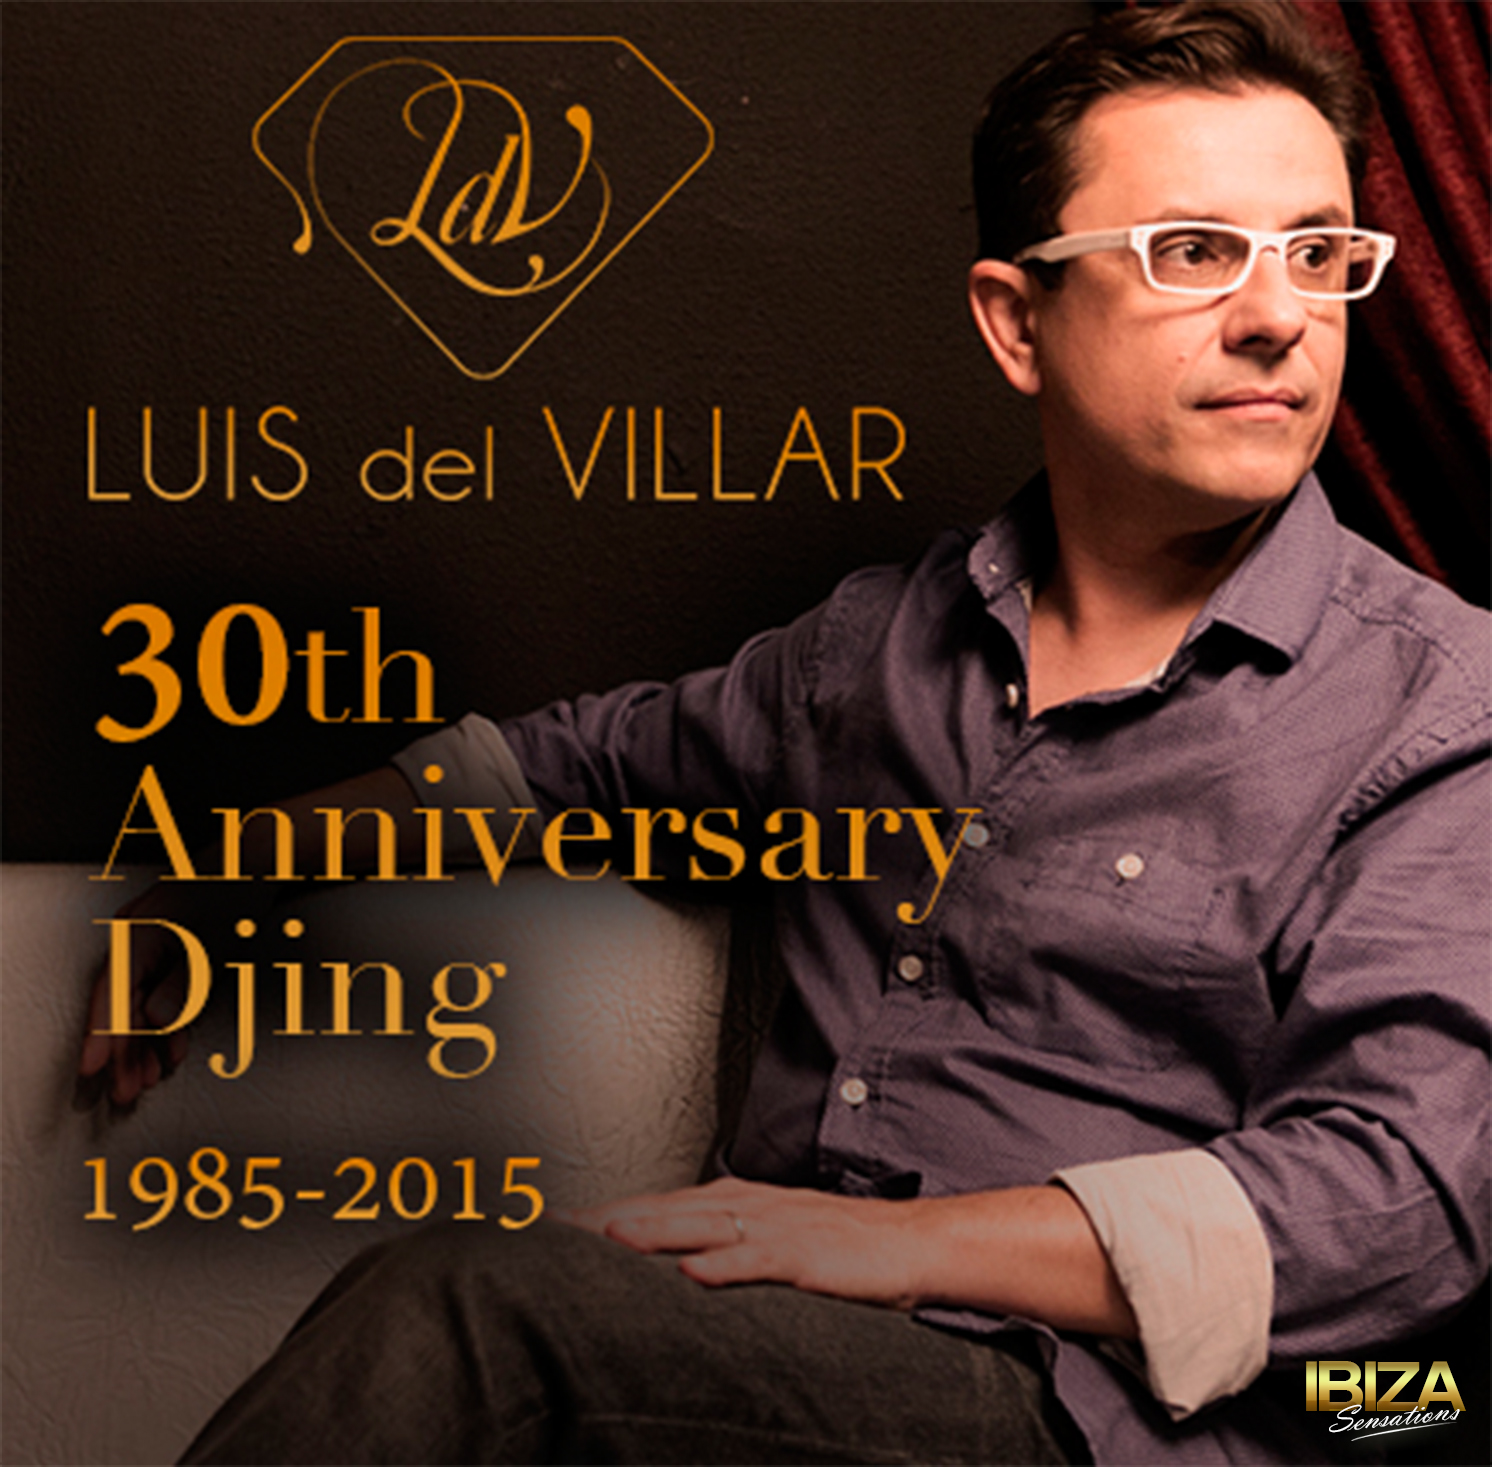 Artwork for Ibiza Sensations 127 Celebrating 30th Anniversary Djing 1985-2015